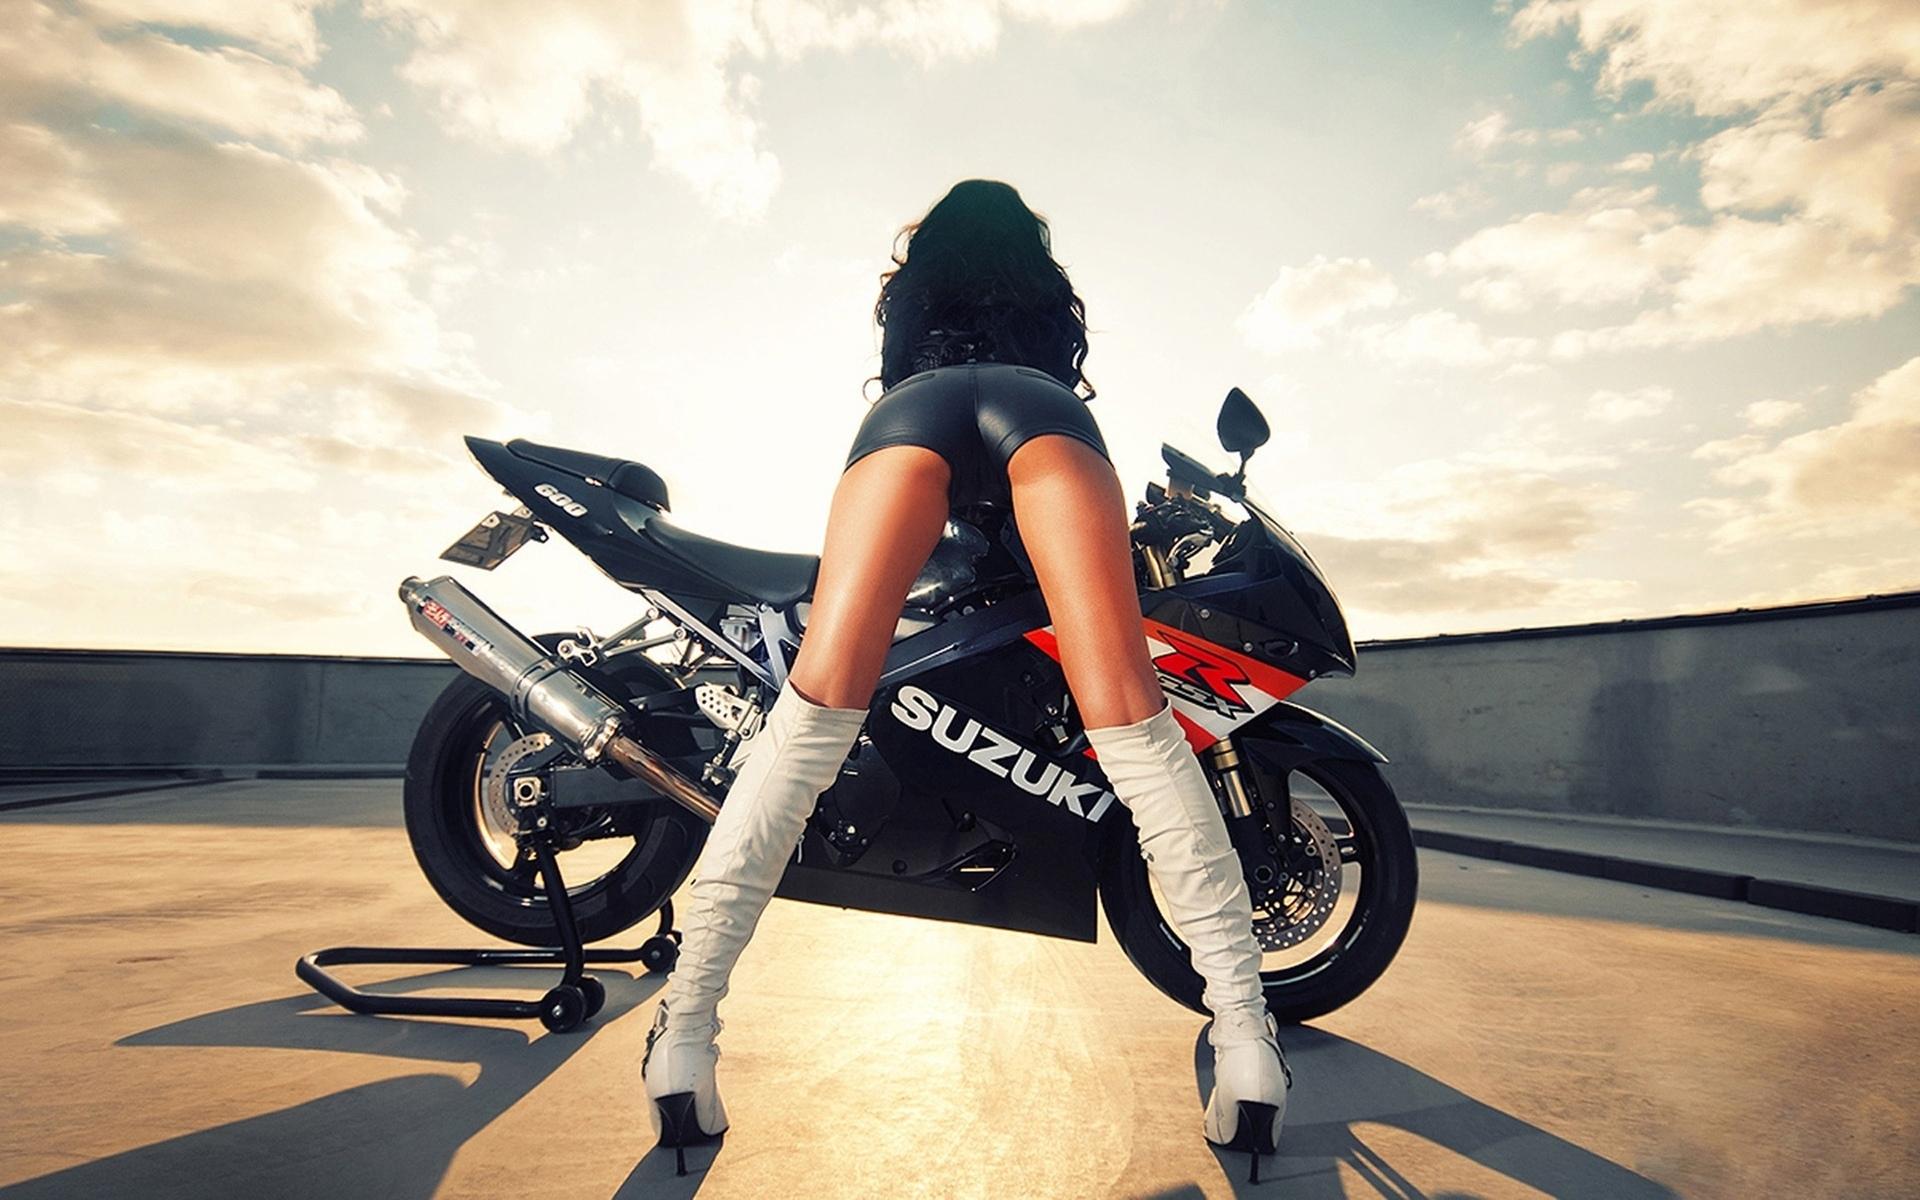 Ютуб мотоциклист и секс 23 фотография